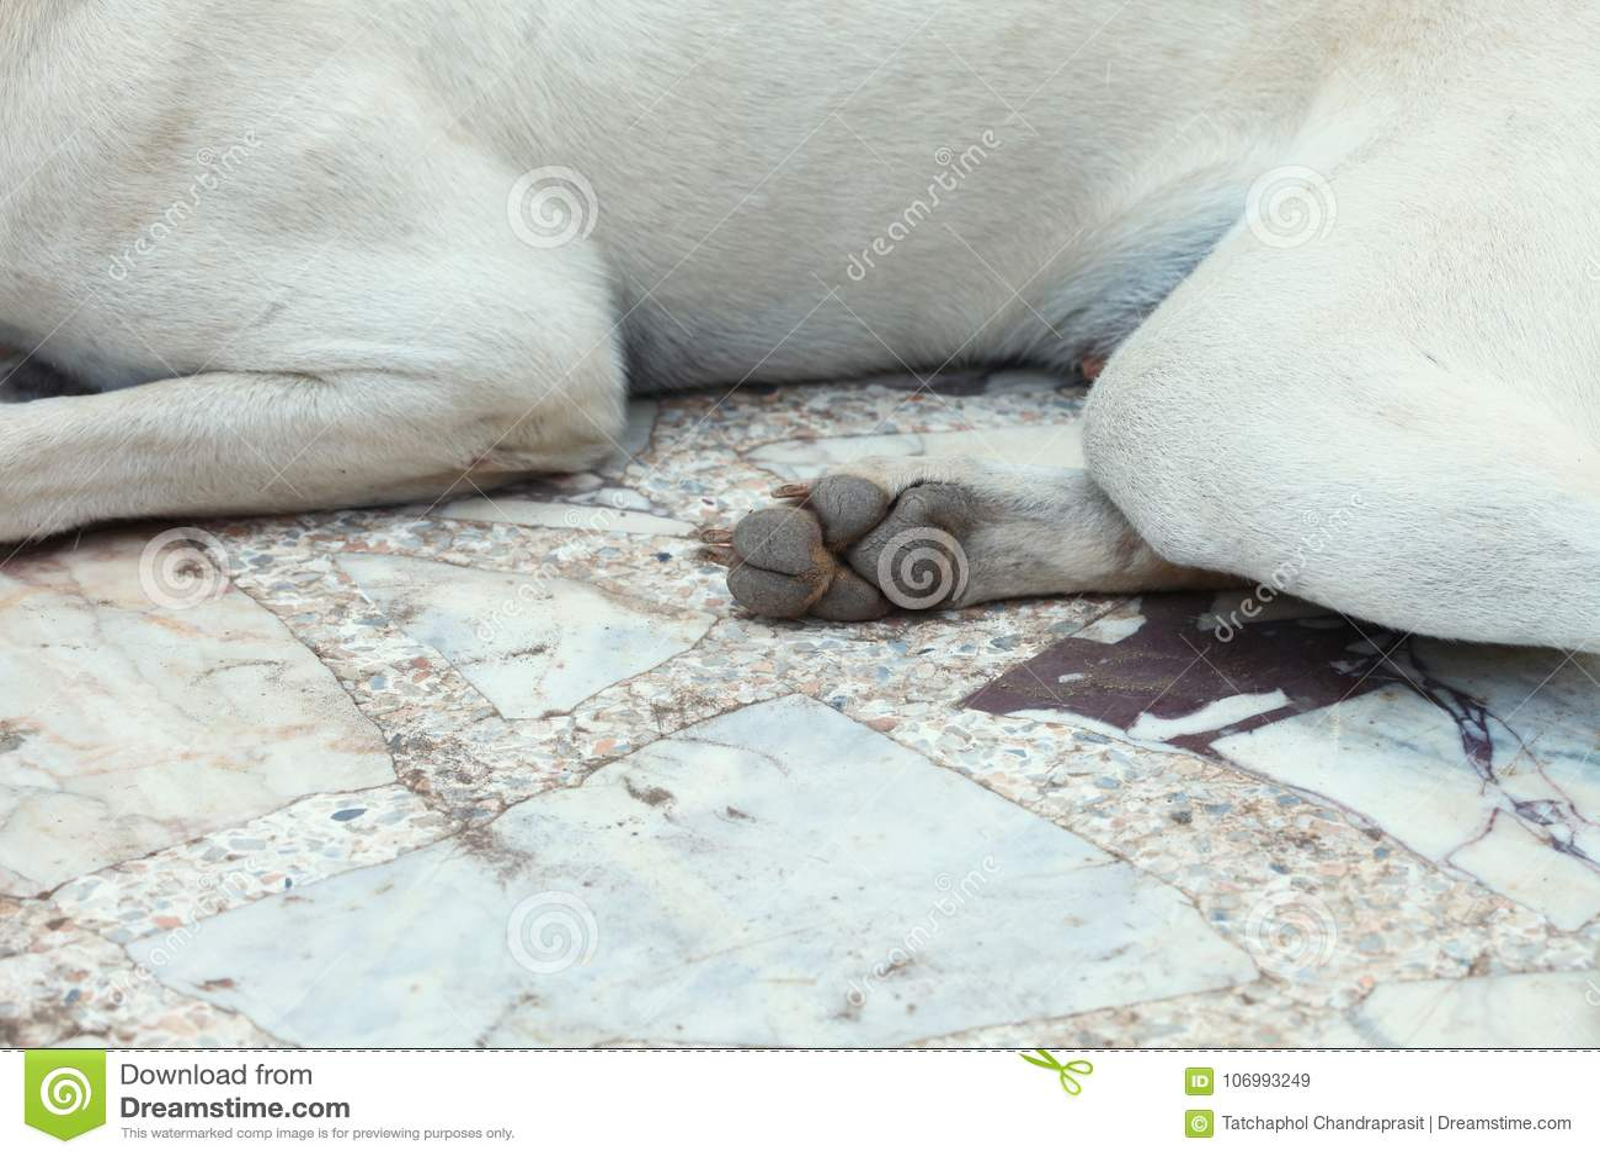 Dog among outdoor scene. stock image. Image of forelimb - 106993249